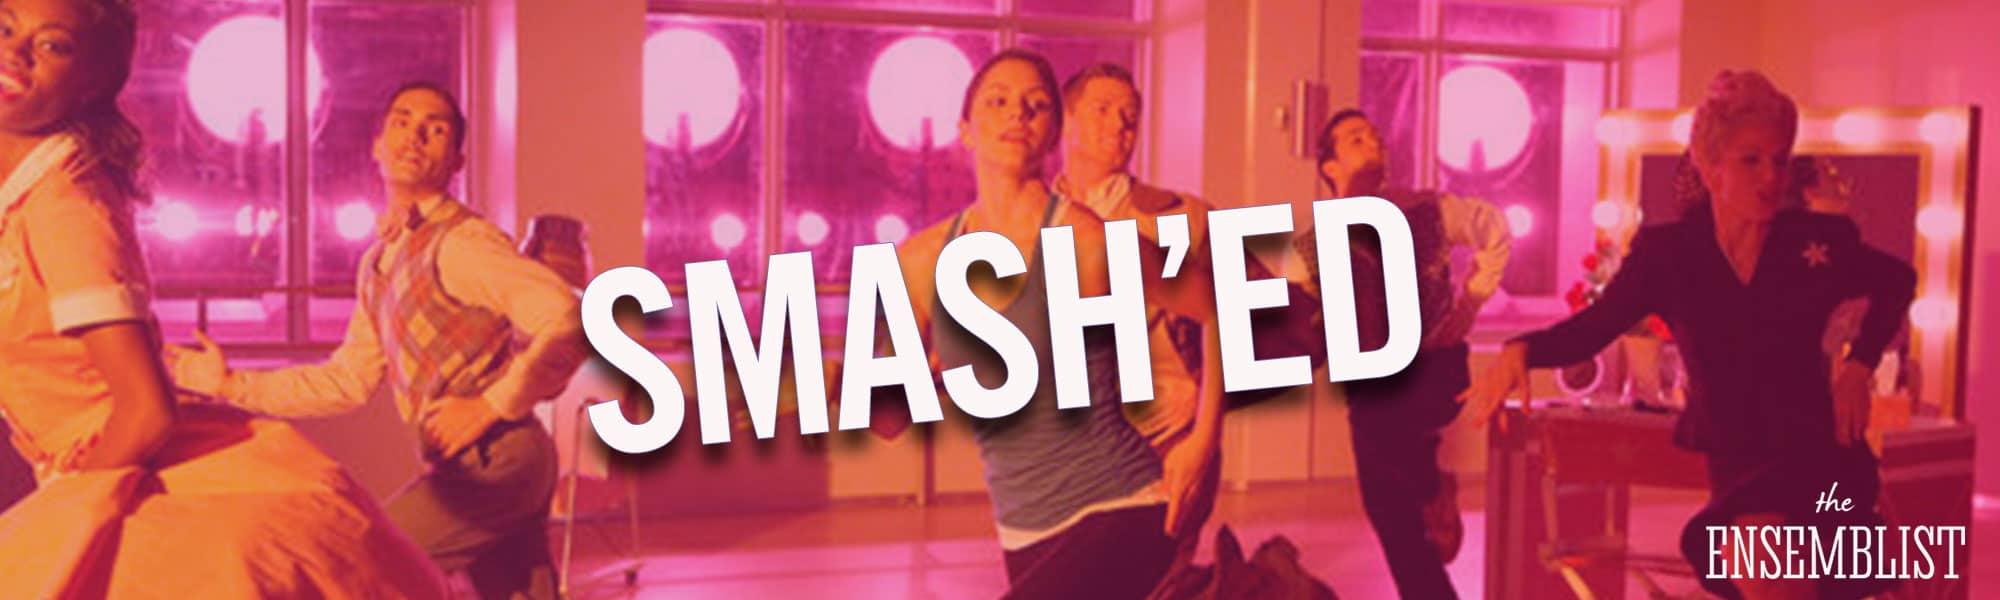 SMASH'ED Miniseries from The Ensemblist with Mo Brady